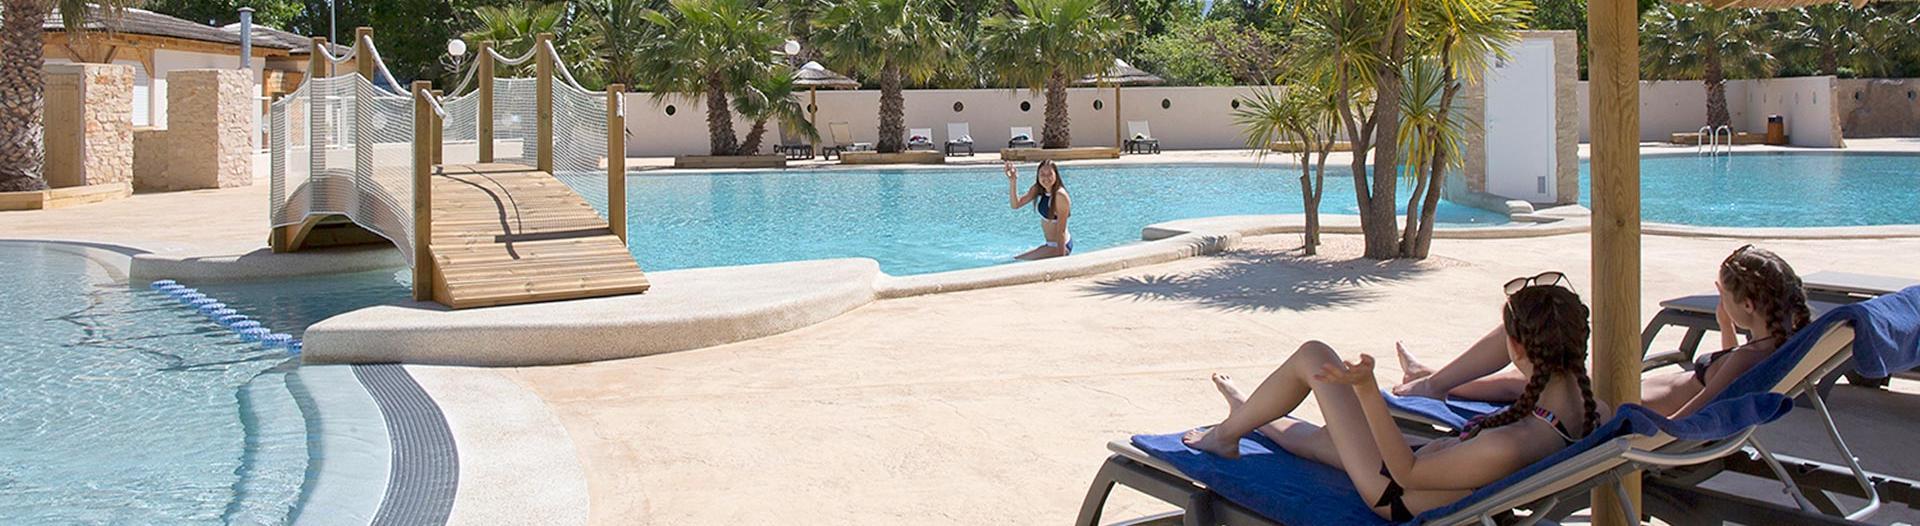 slider-camping-florida-piscine